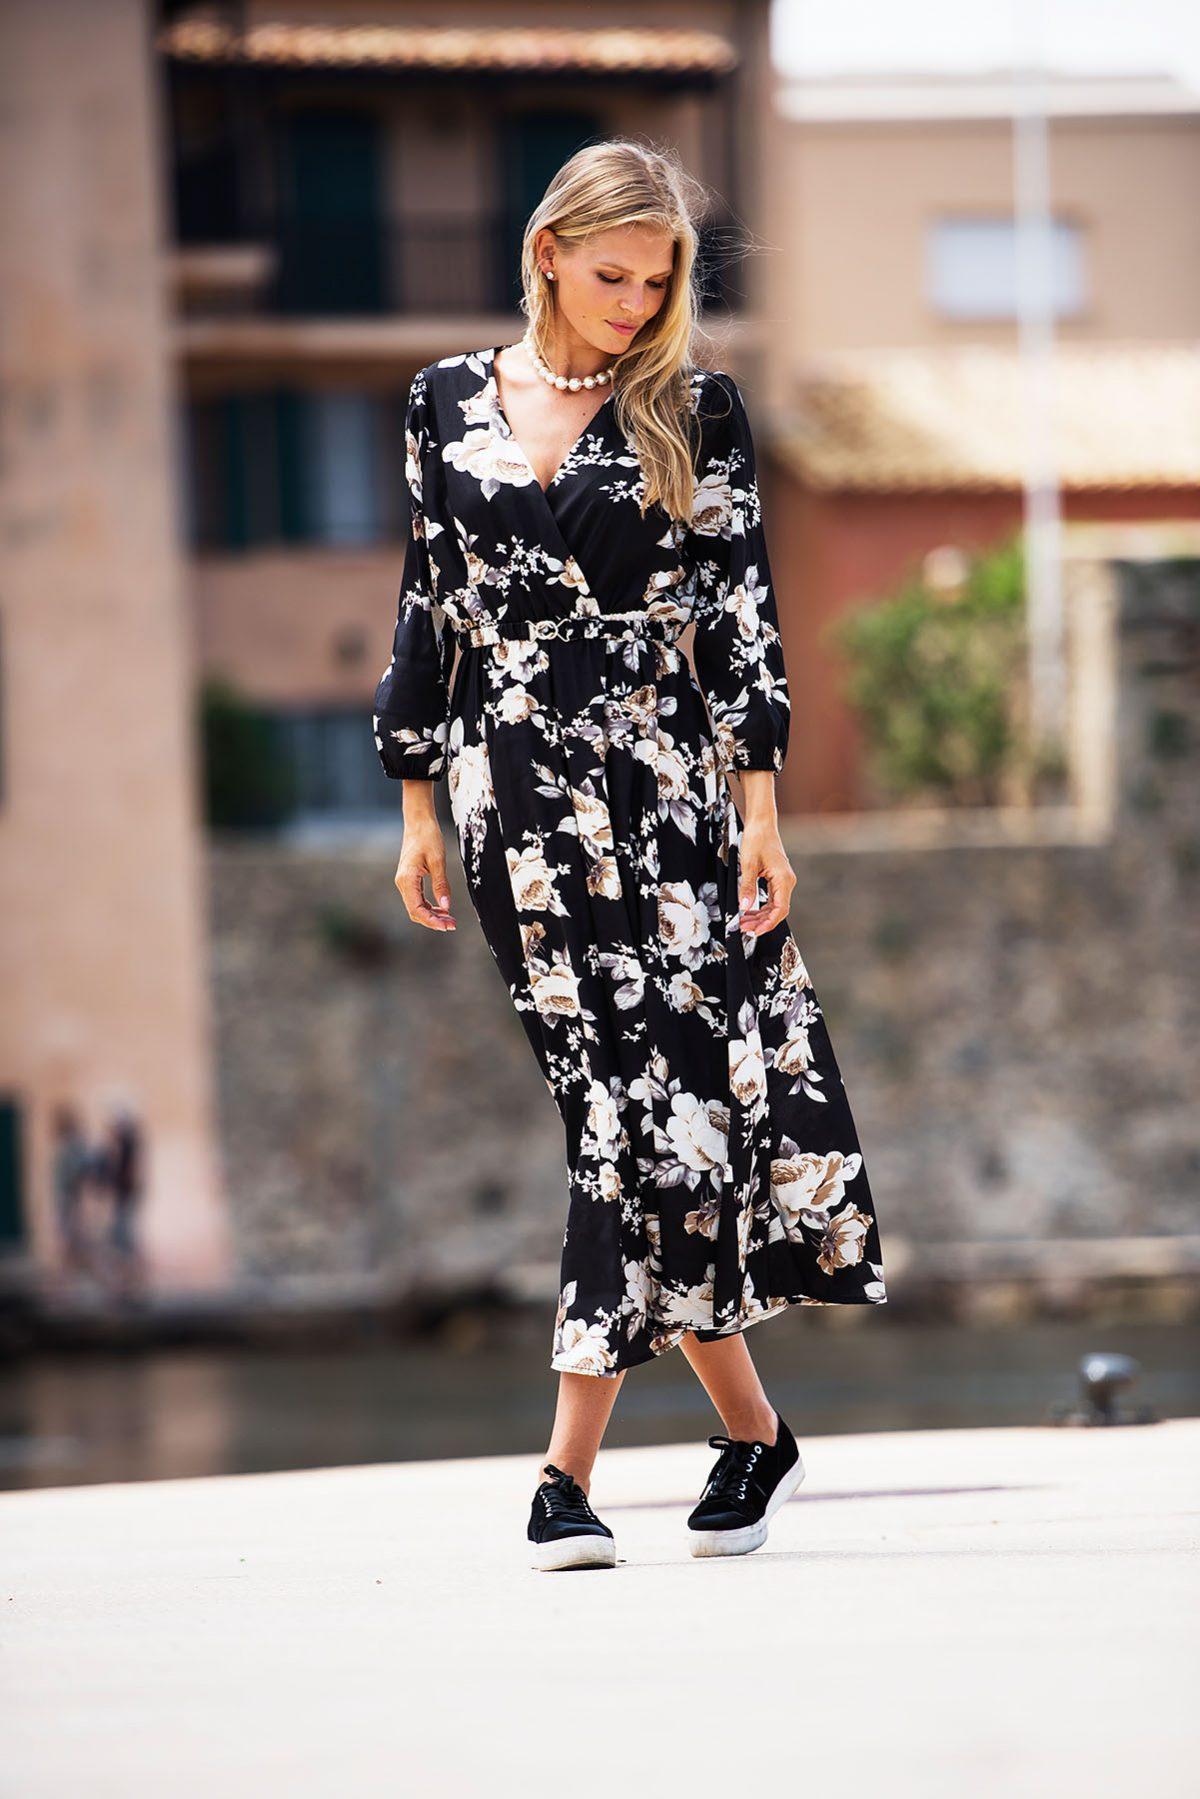 20471a4d07c2 Lang kjole Ane Mone - Bryggerhuset på Jahren